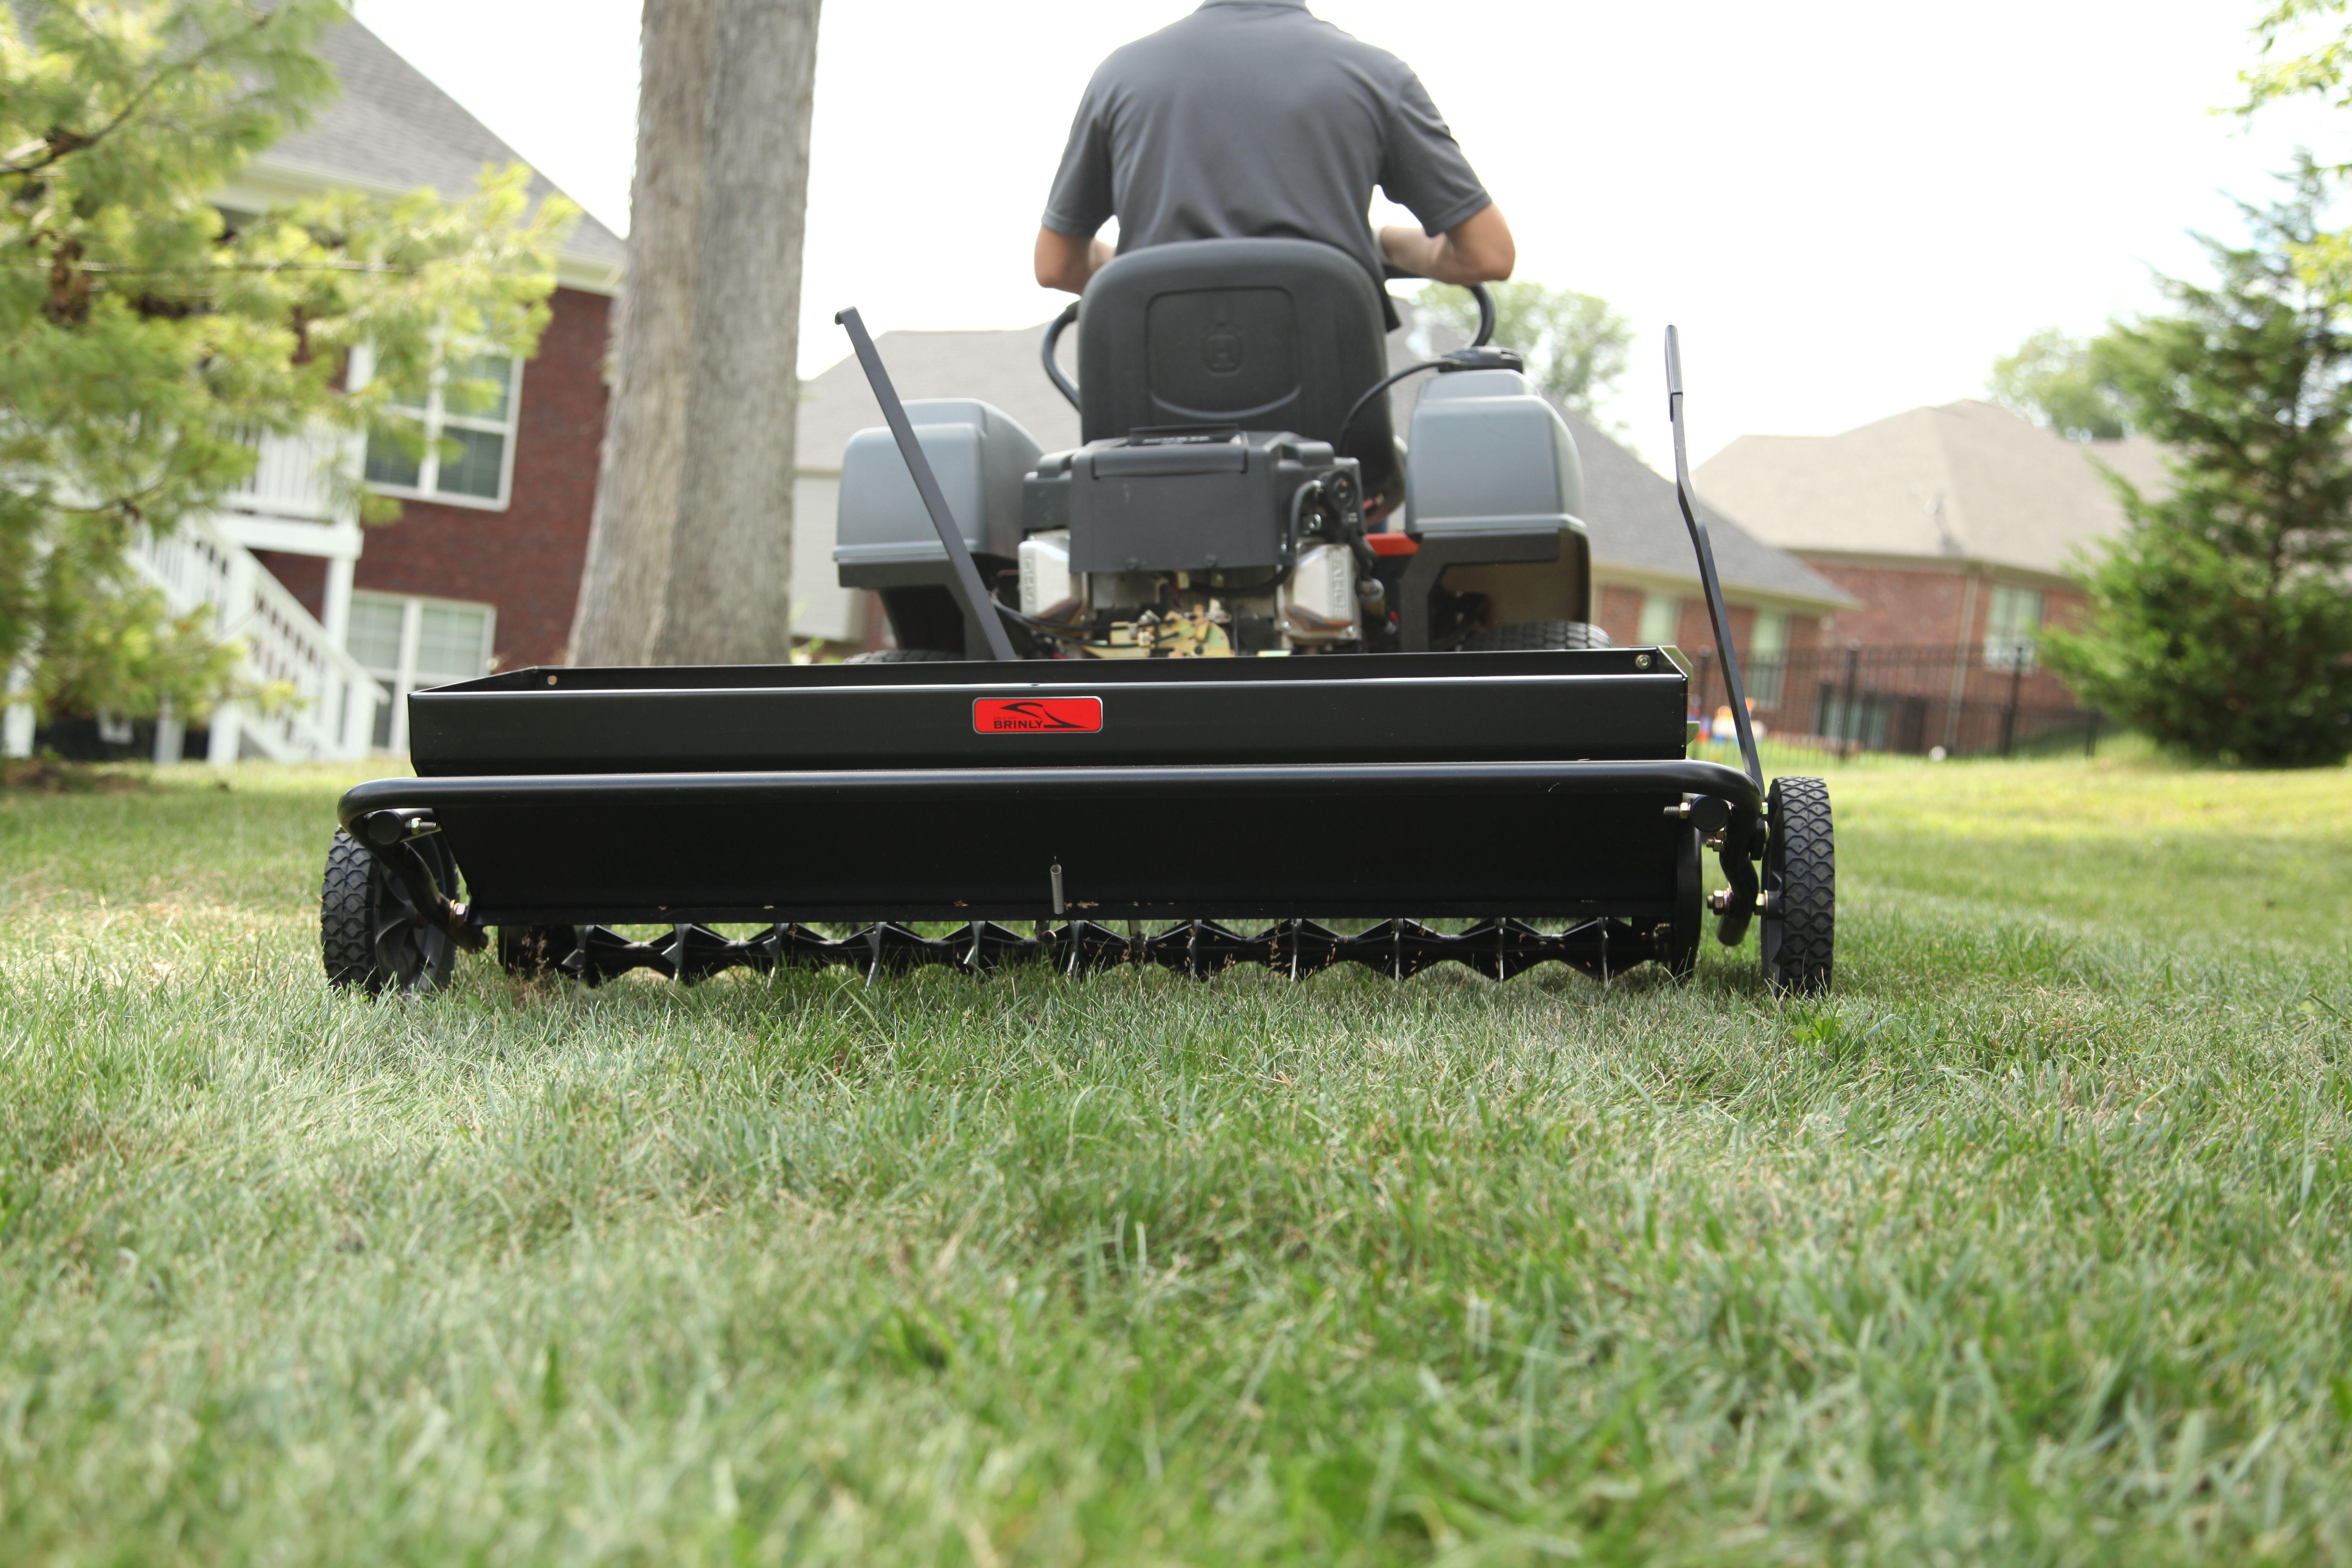 40 Aerator Spreader Lawn Fertilizer Spreader Spring Lawn Care Aerator